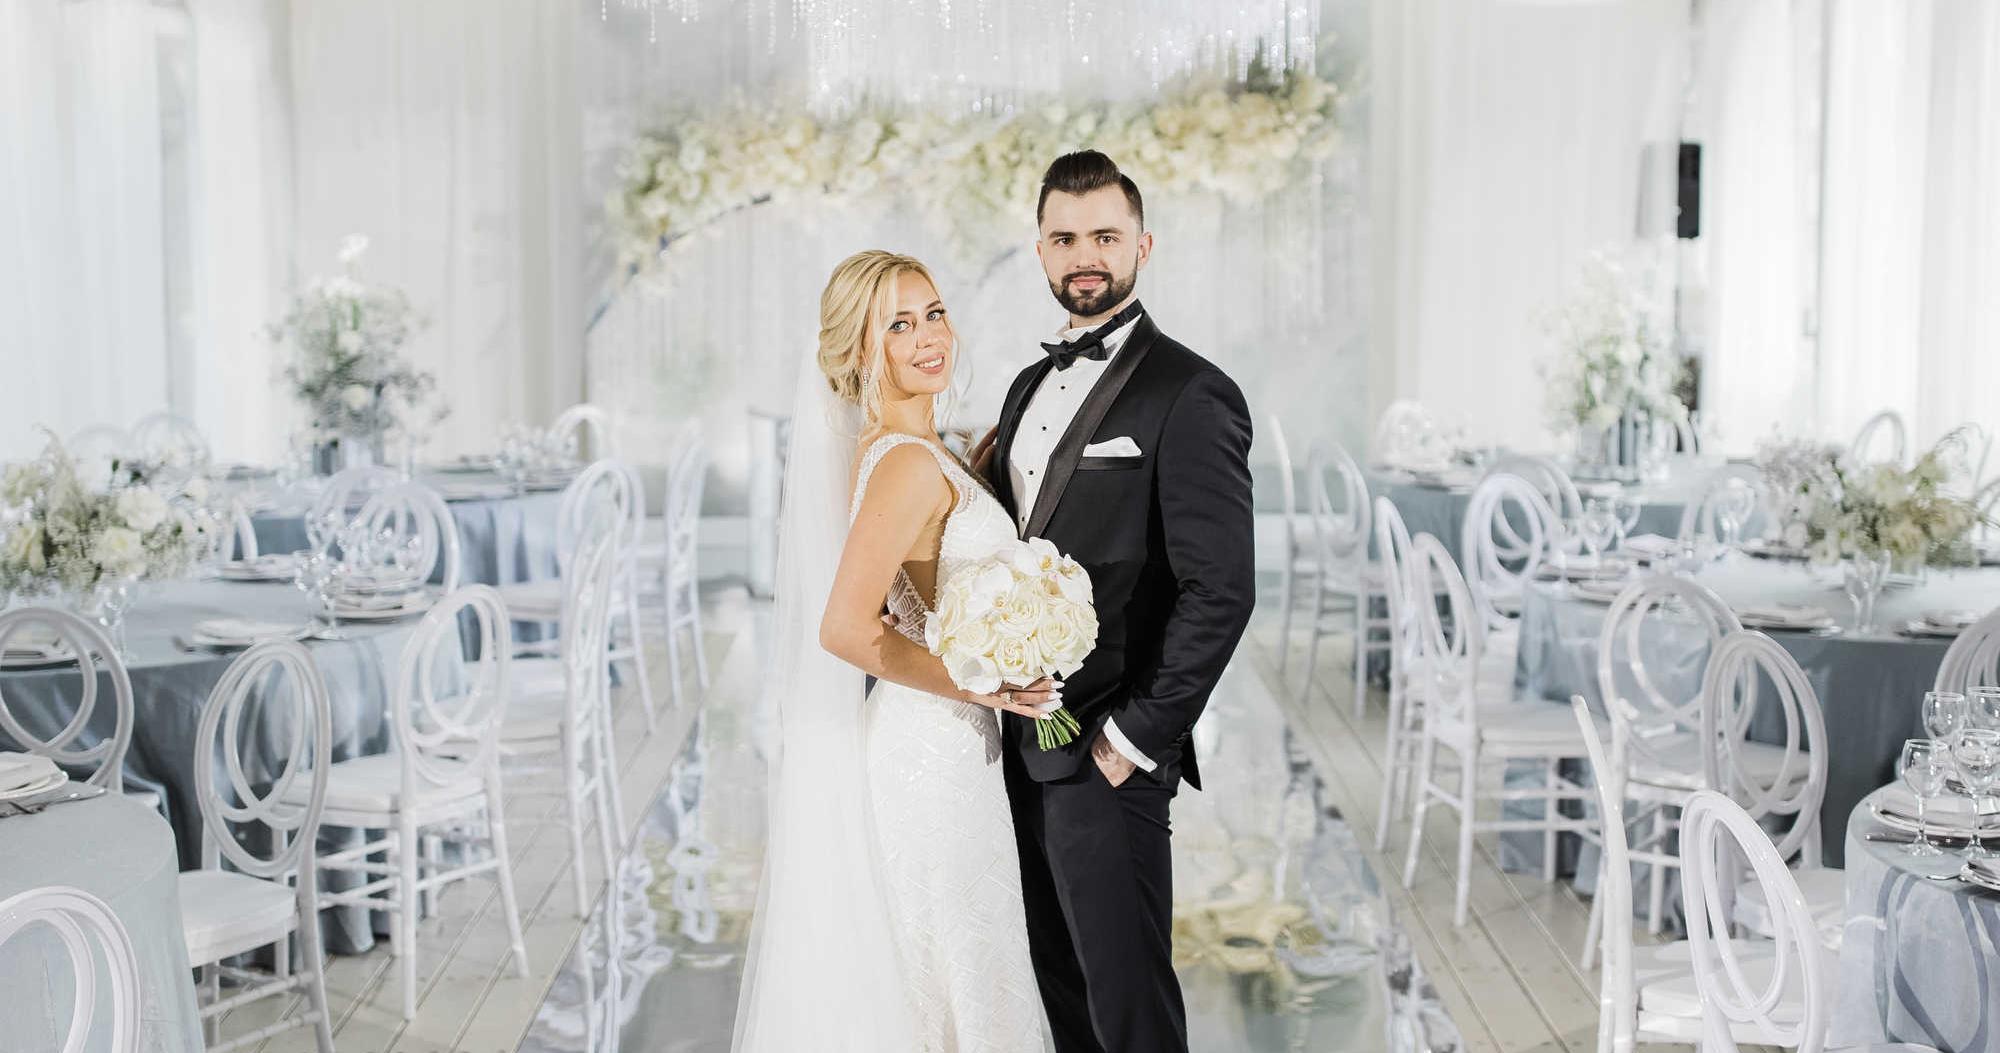 Белоснежная свадьба с хрусталем